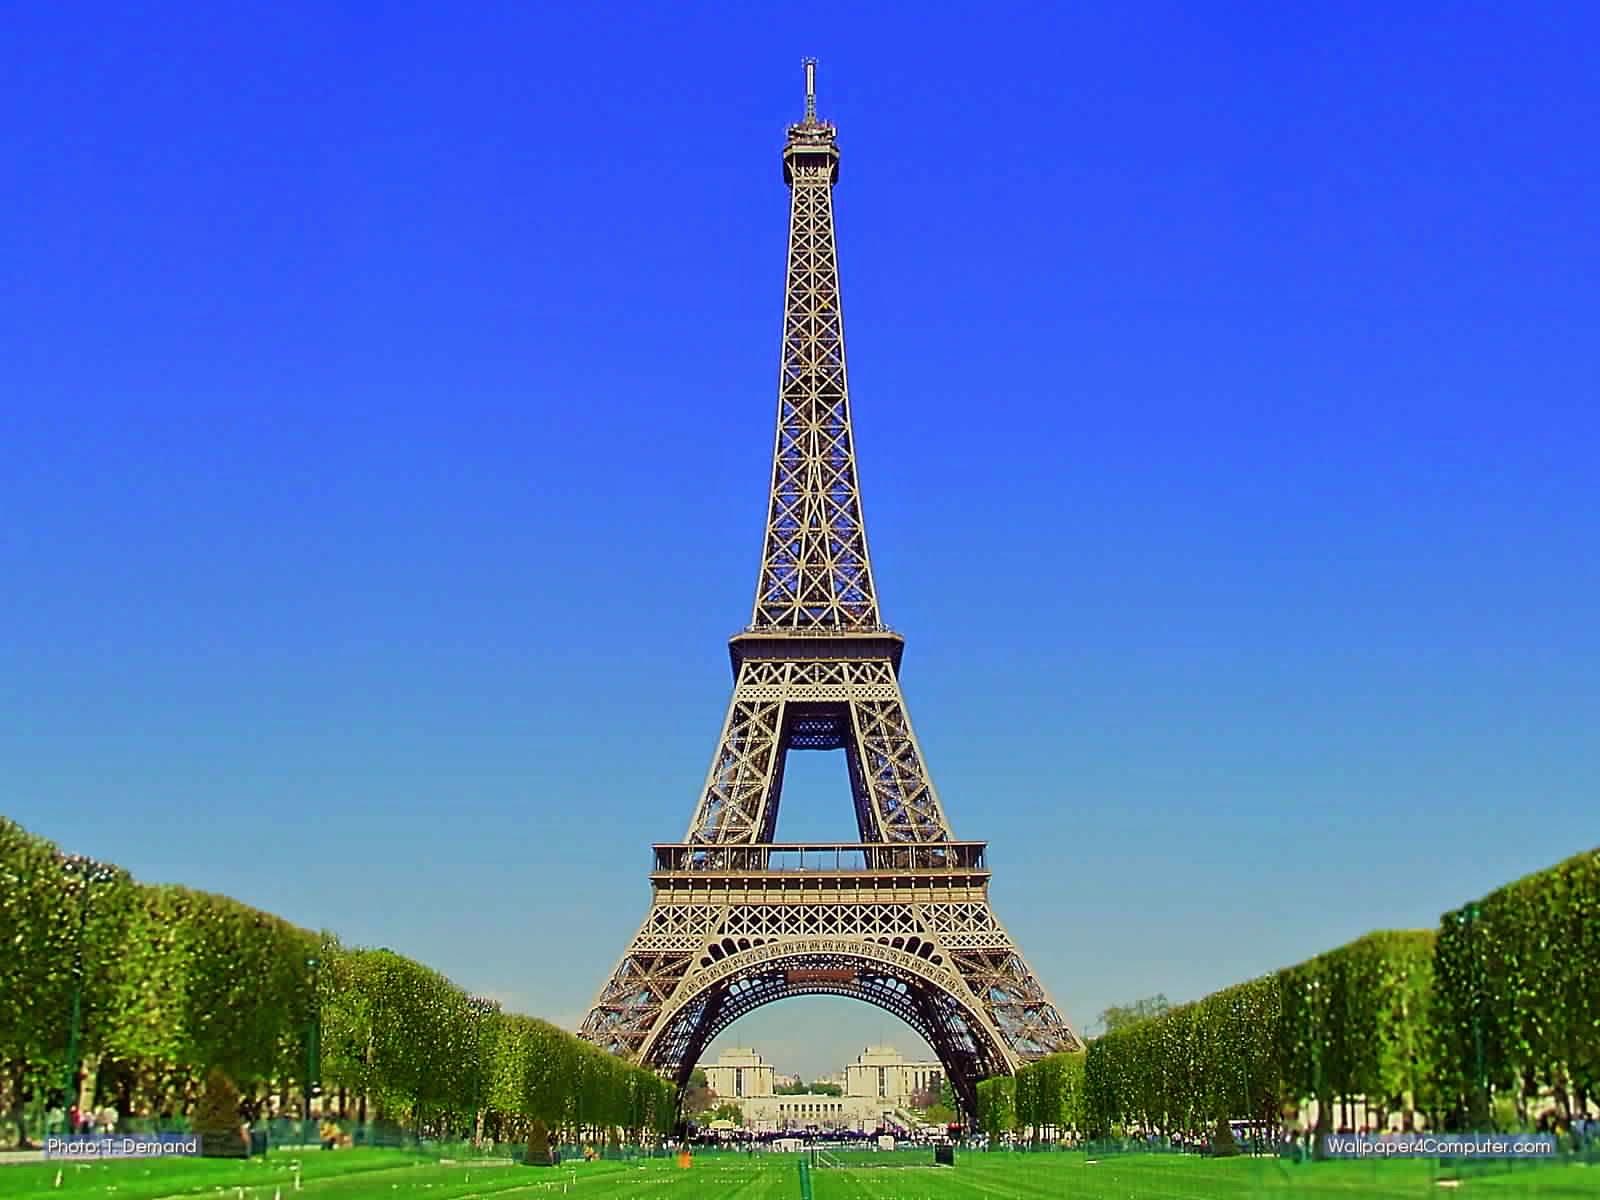 صور صور لبرج ايفل , برج ايفل وفخامته